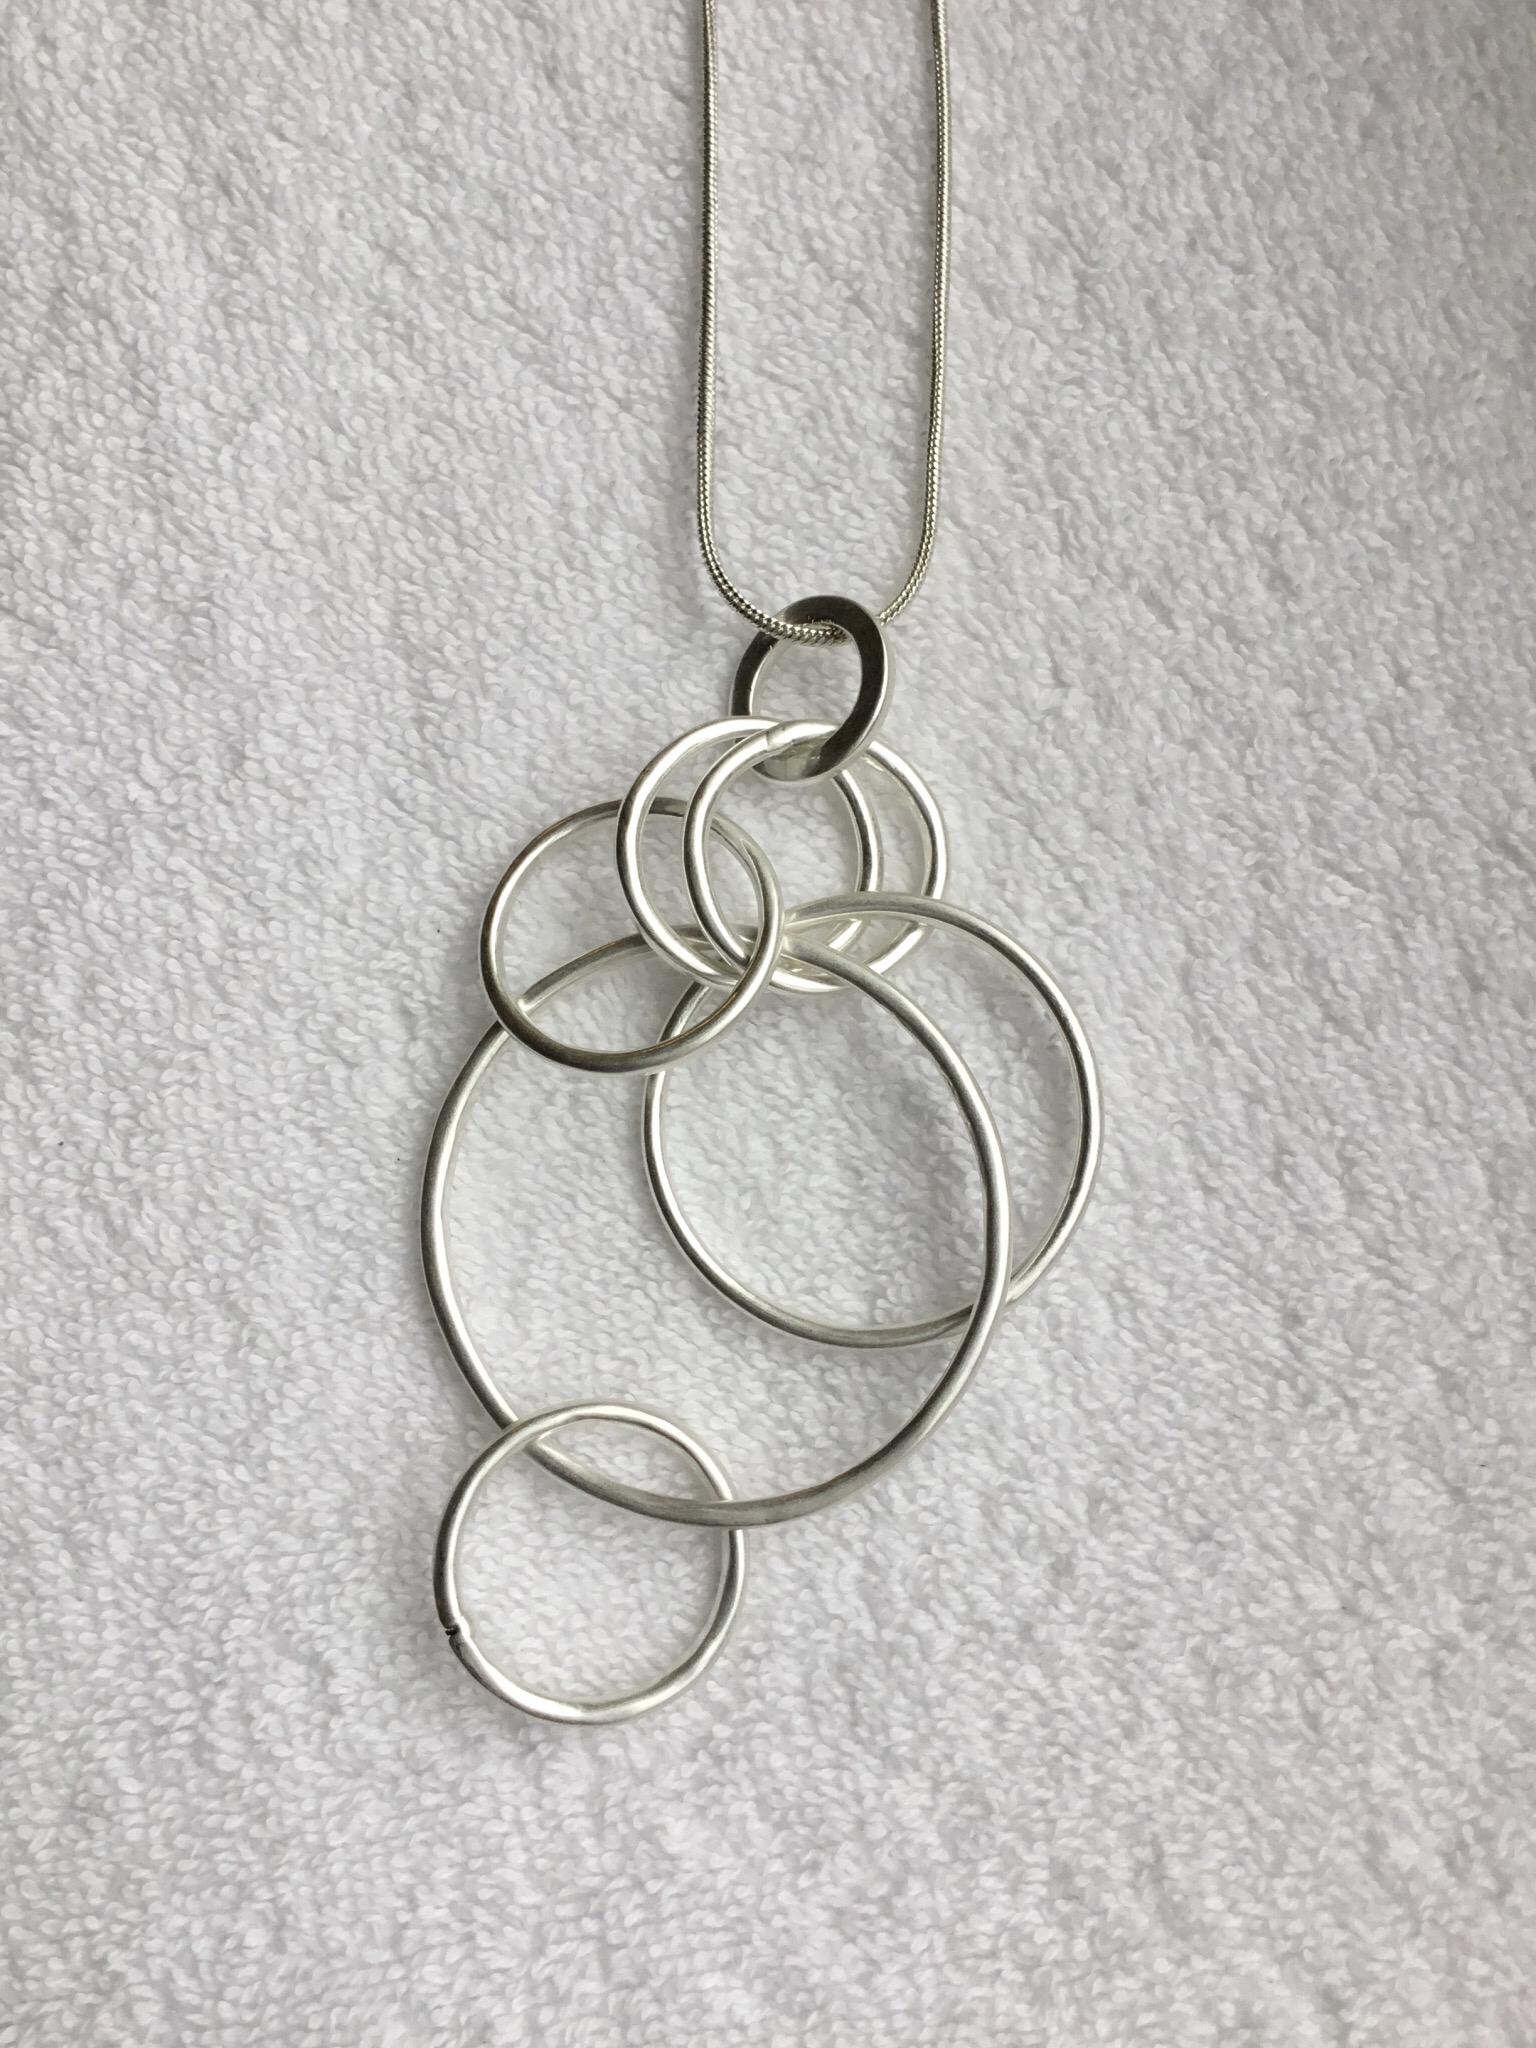 Hanging Circle Link Necklace  JNL-005-7013